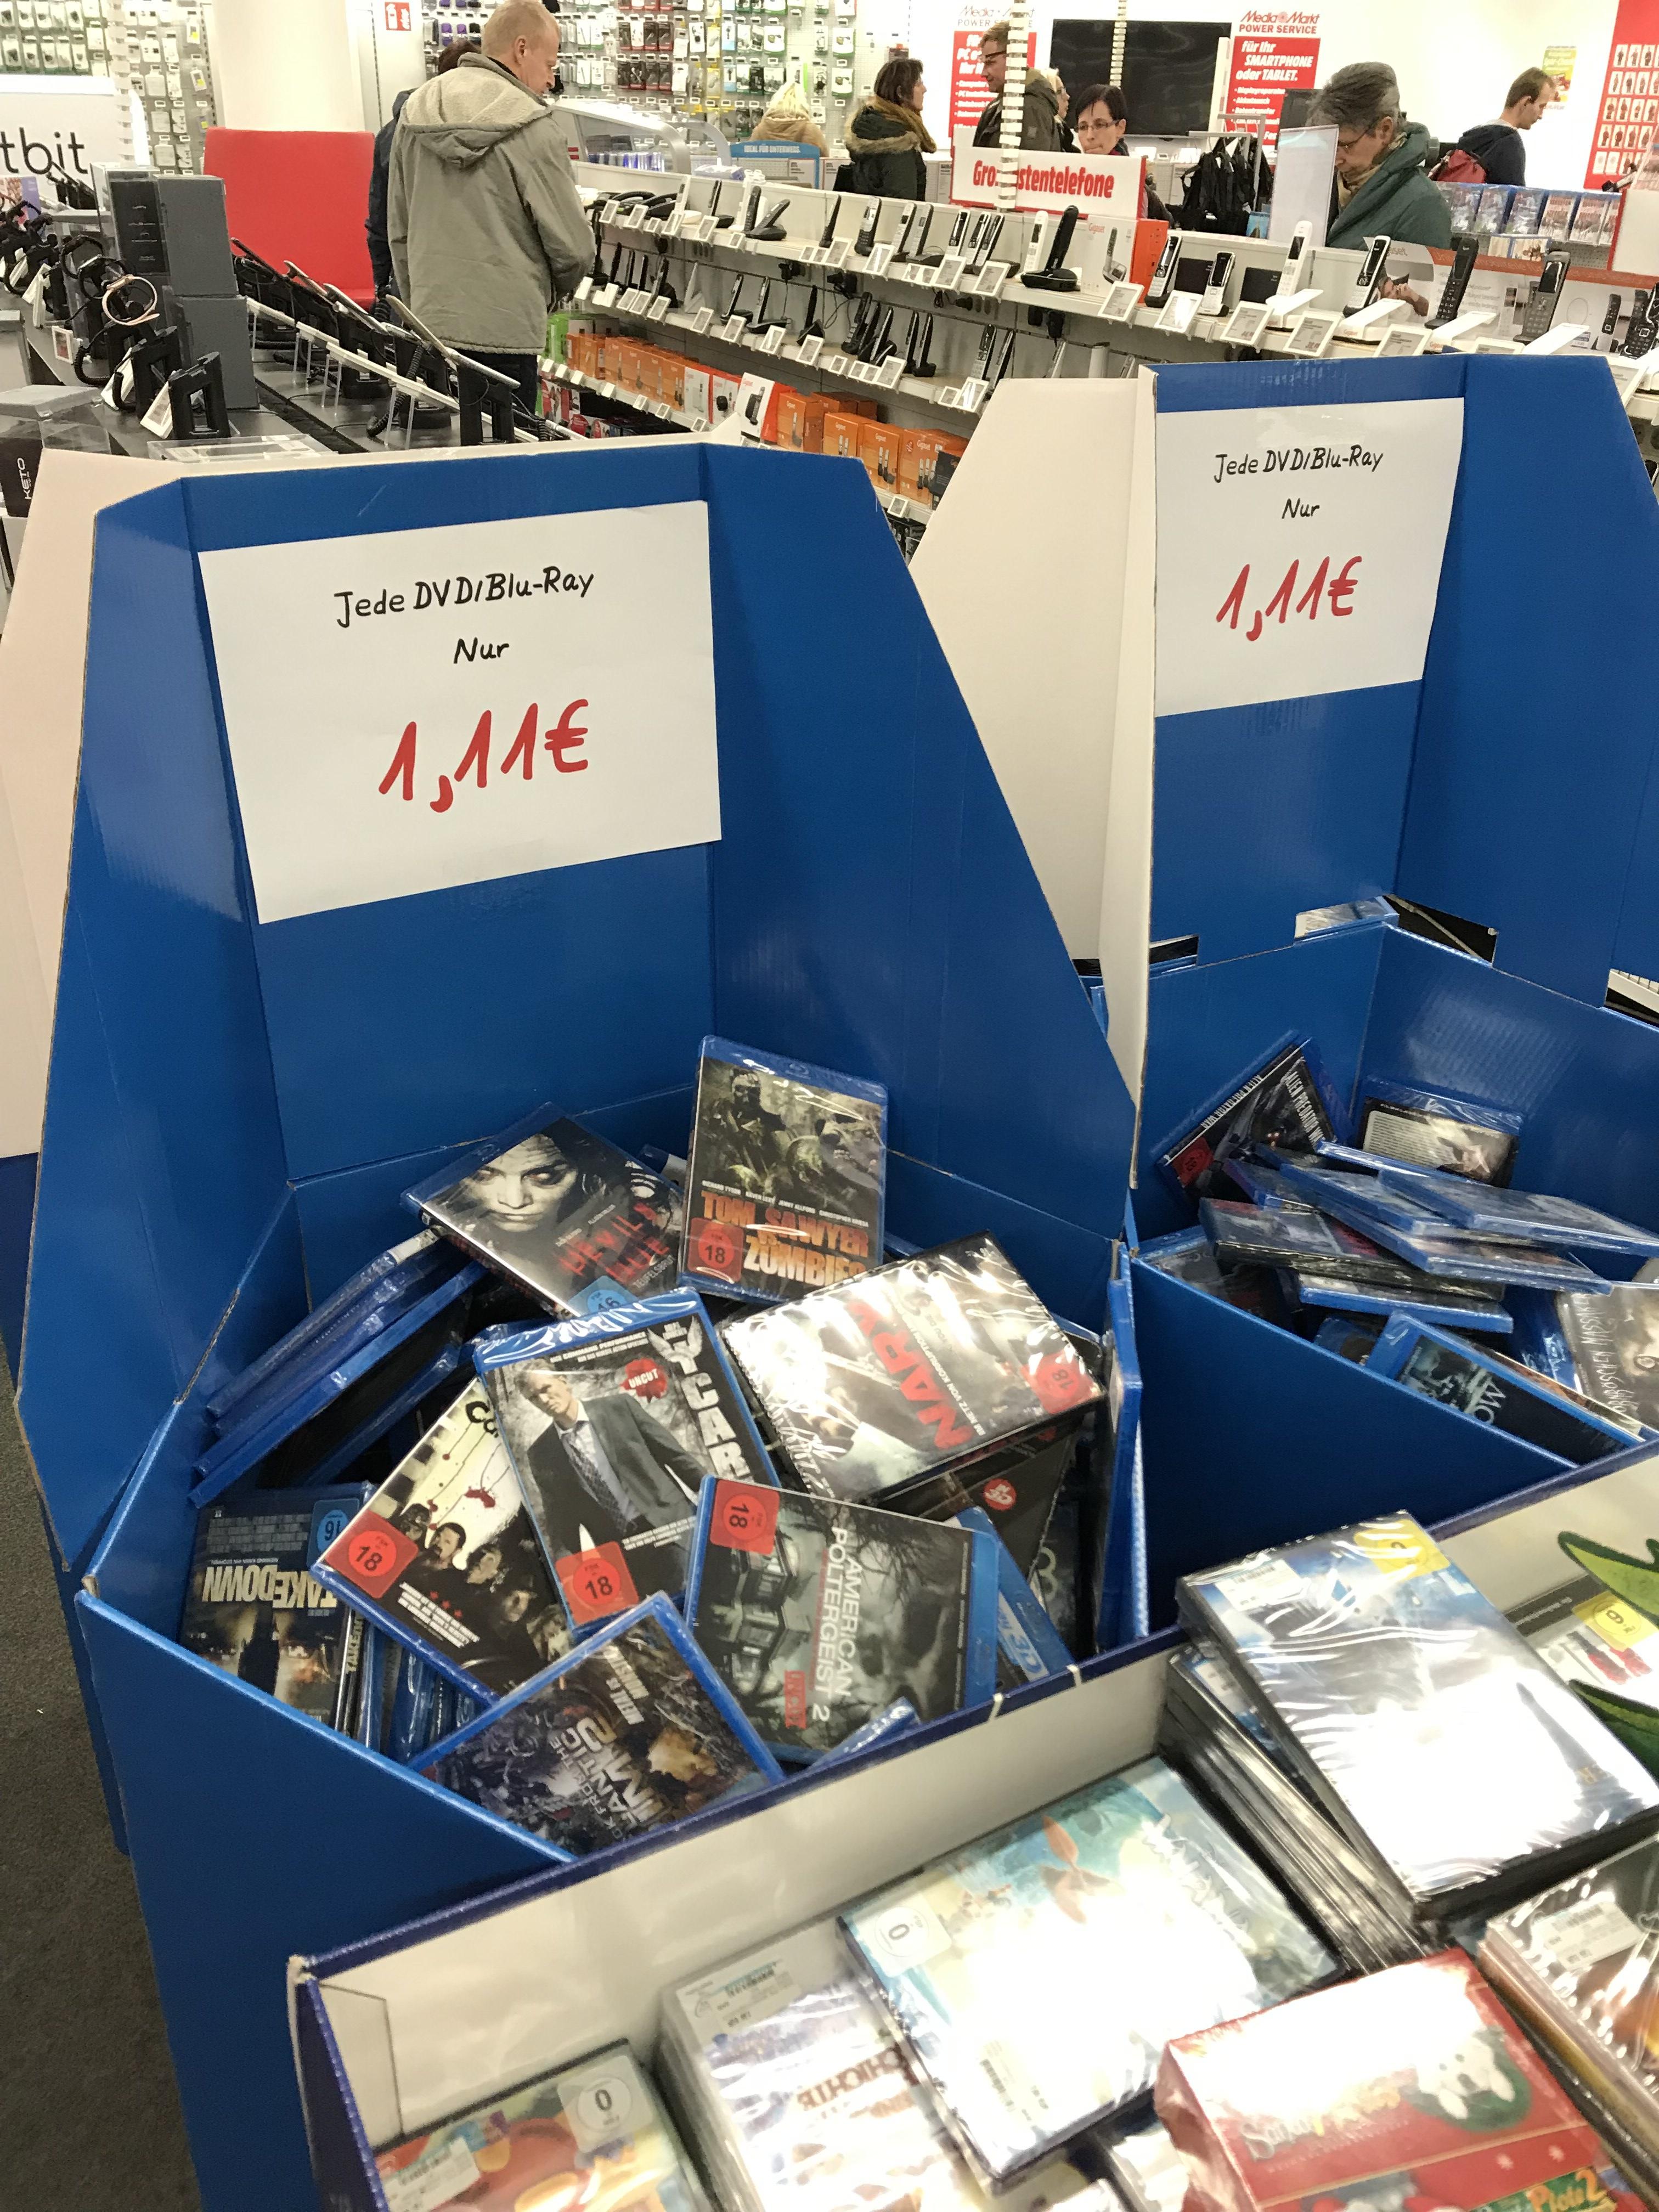 Jede Blu-Ray / DVD 1,11€ Lokal Berlin Hohenschönhausen Media Markt